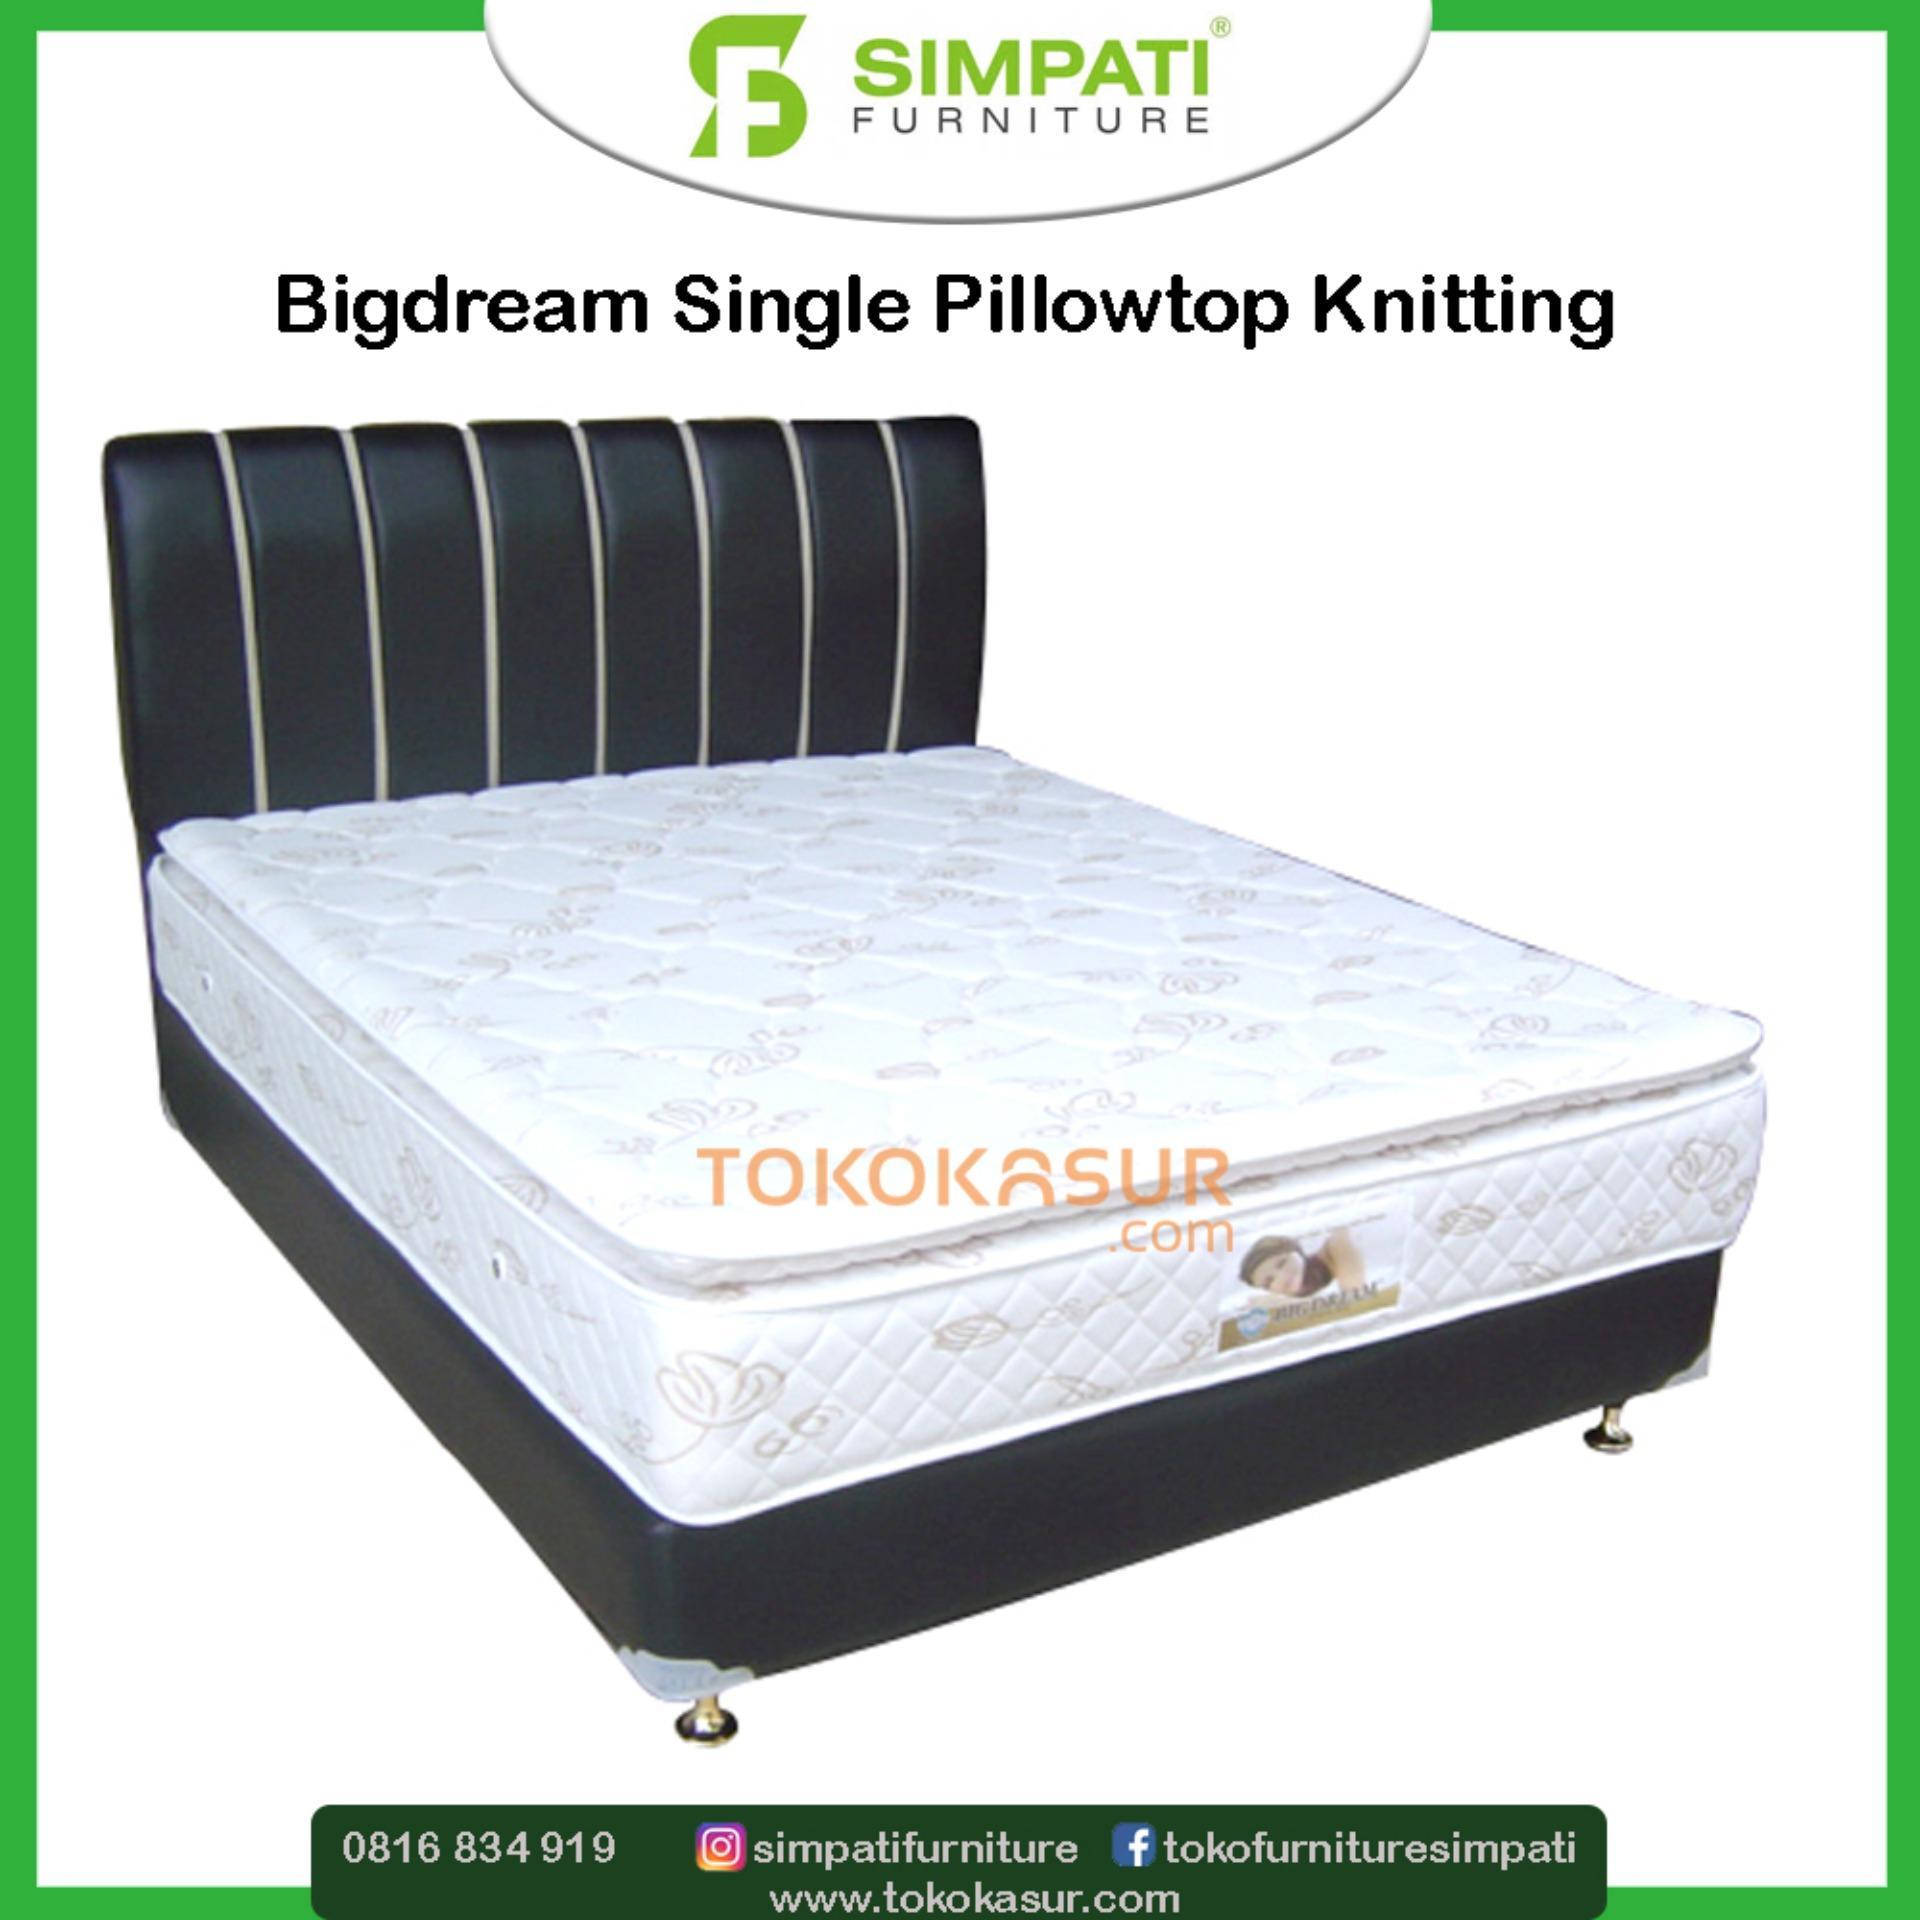 Bigdream Single Pillowtop 160x200 Kasur Tanpa Divan Sandaran Victory Comforta Super Pedic 90x200tanpa Jadebotabek Only Knitting 100x200 France Oscar